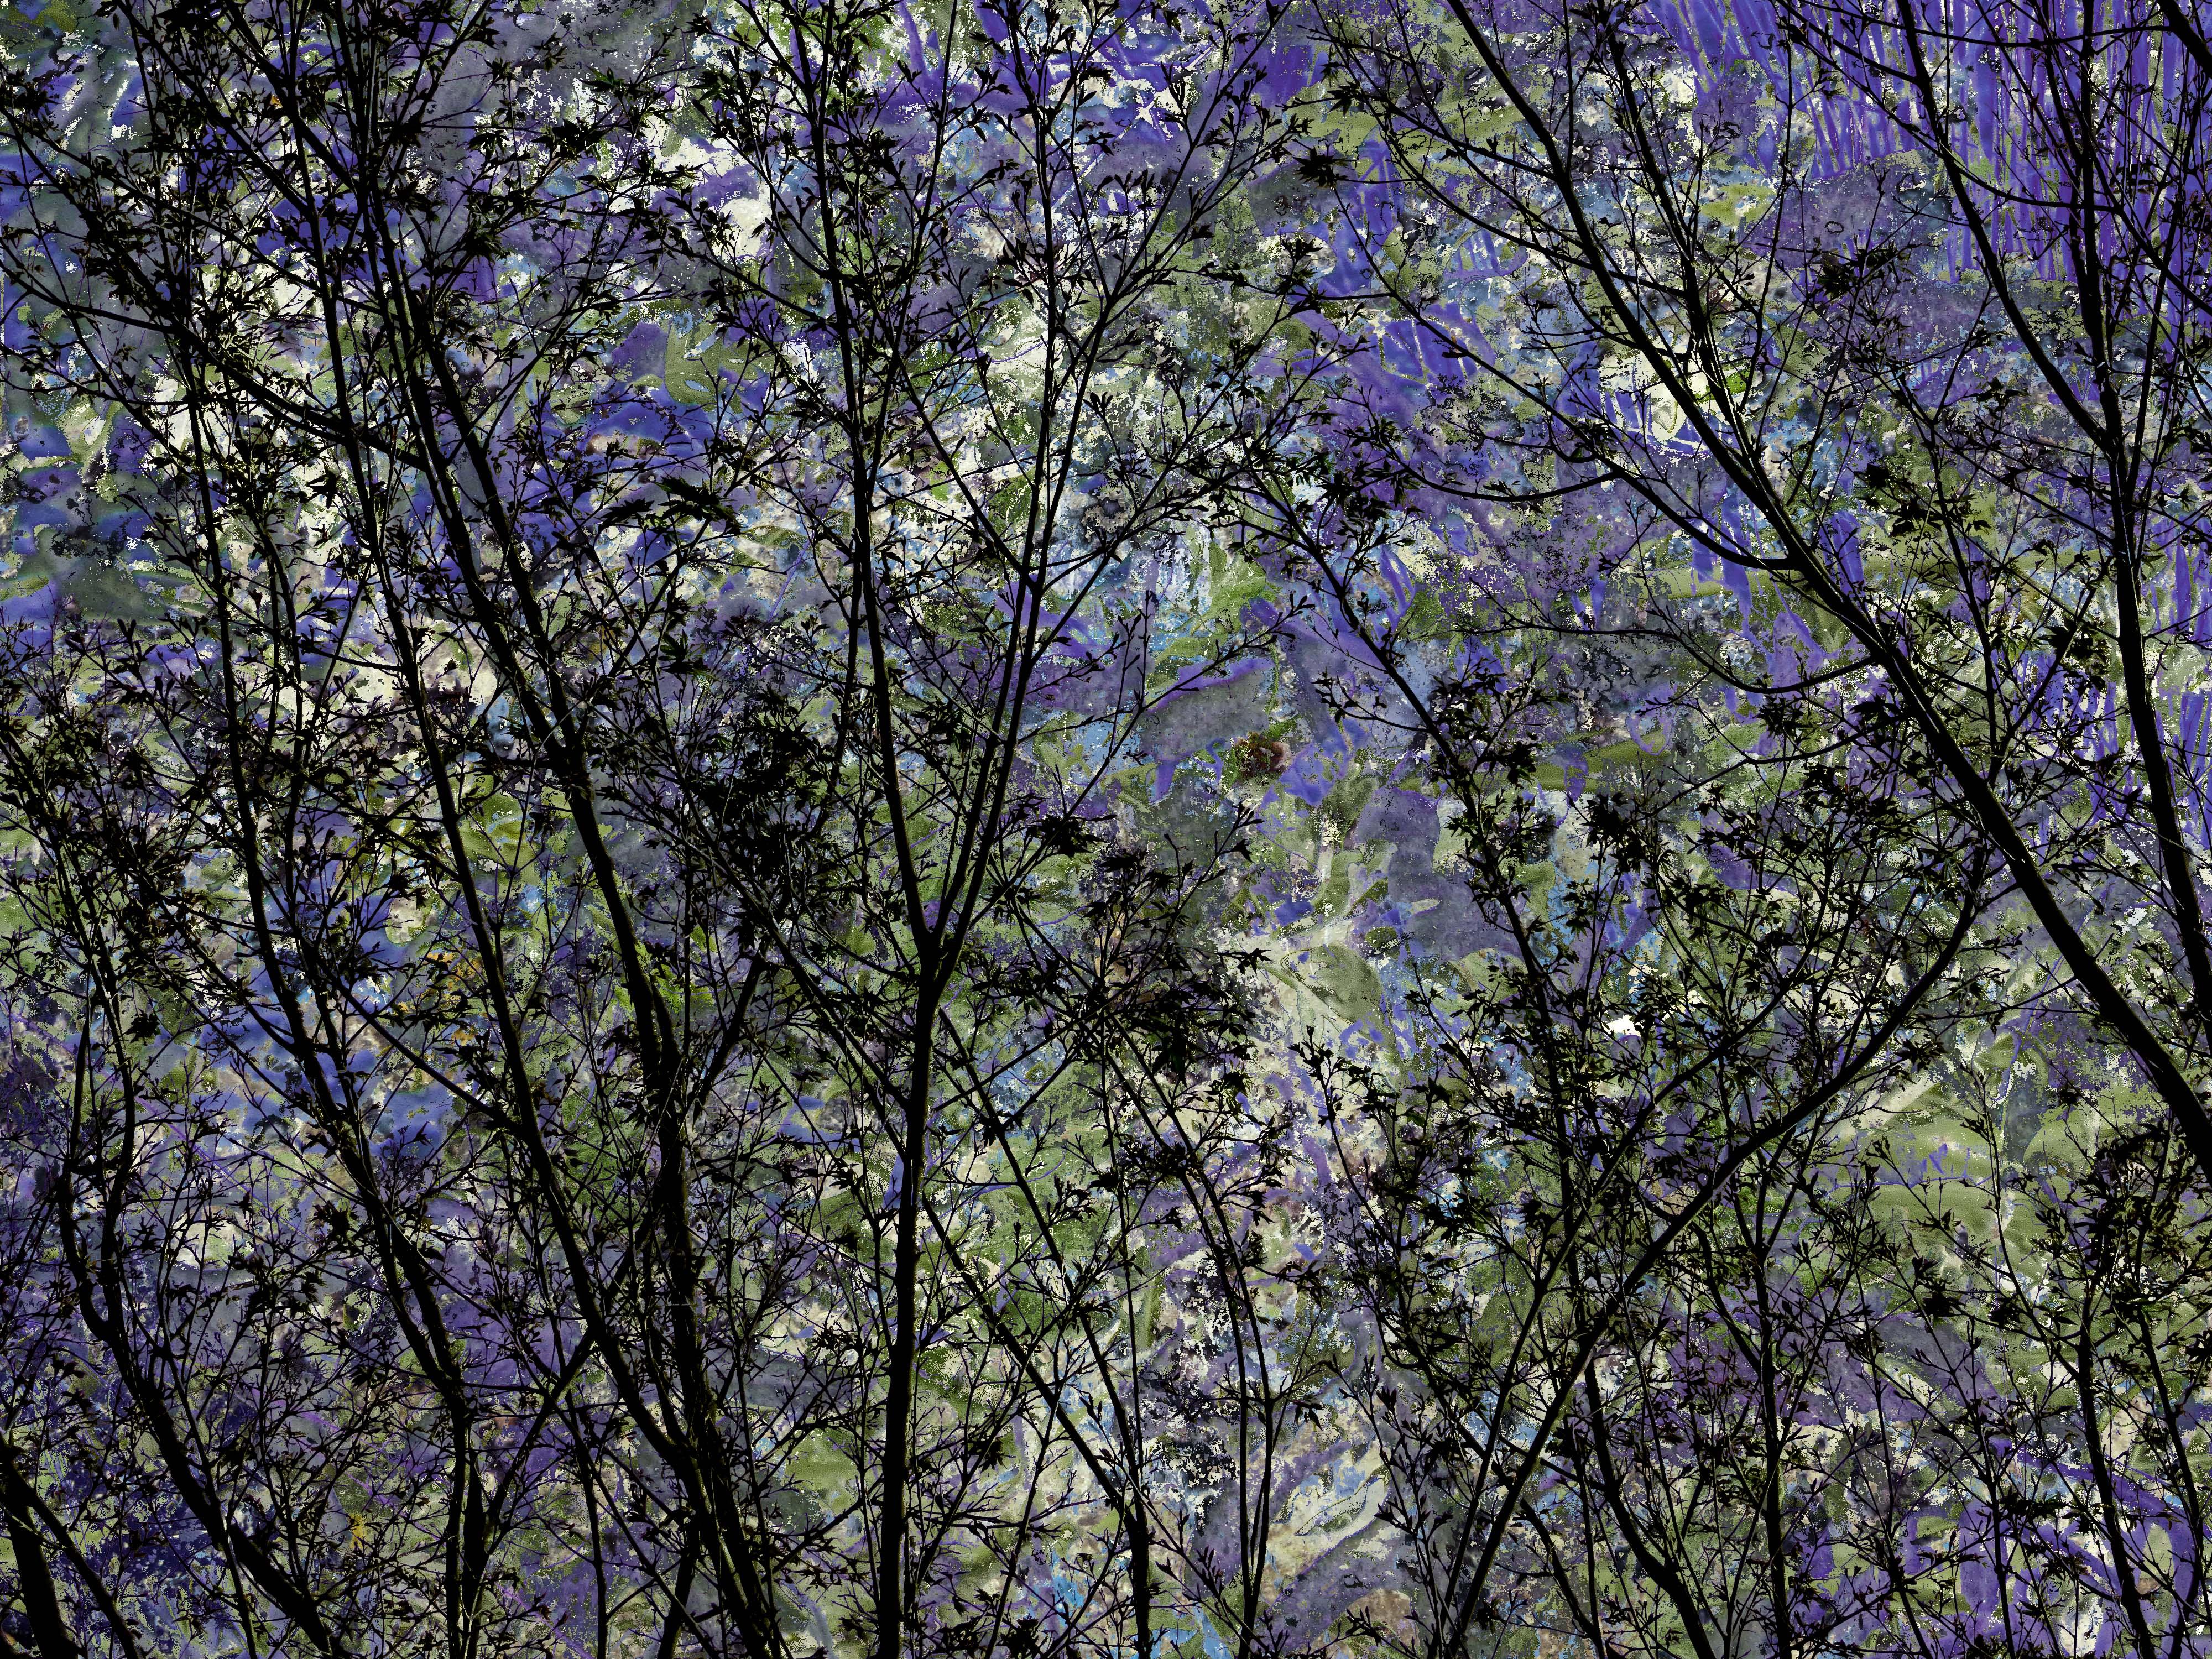 TreeSeries FLW 4545454 gbgbgh.jpg